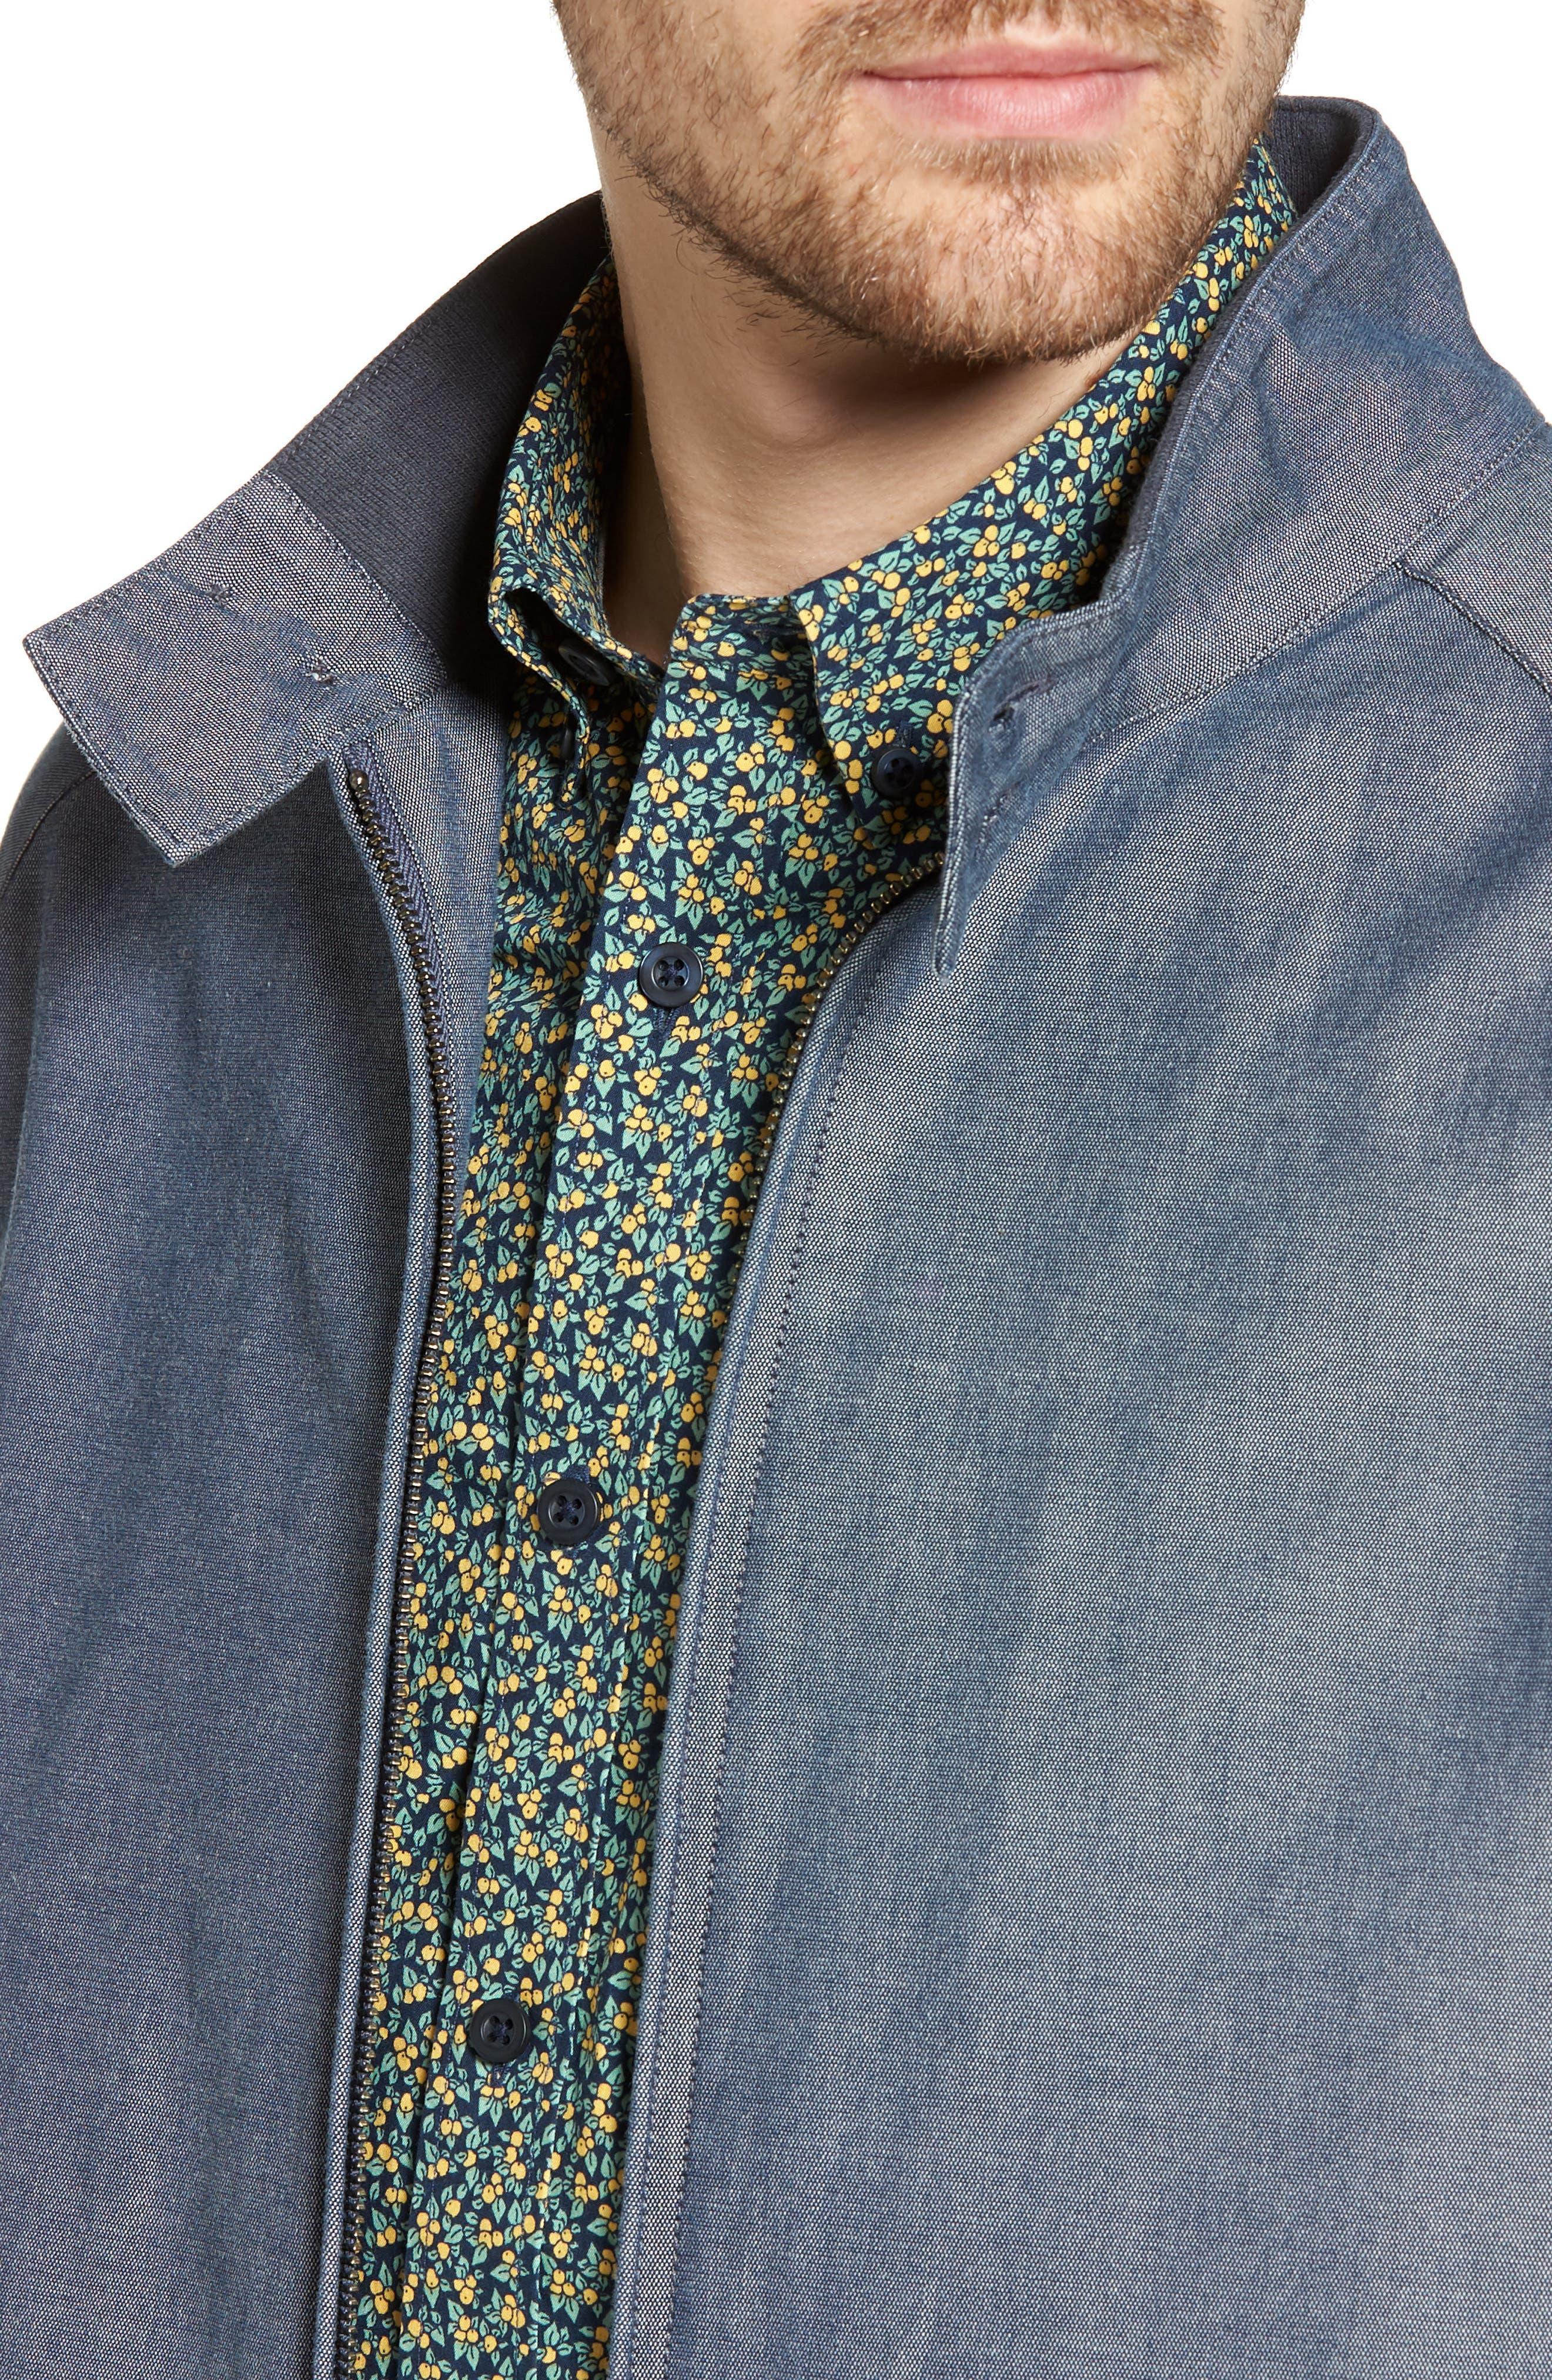 Harrington Jacket,                             Alternate thumbnail 4, color,                             Blue Vintage Chambray